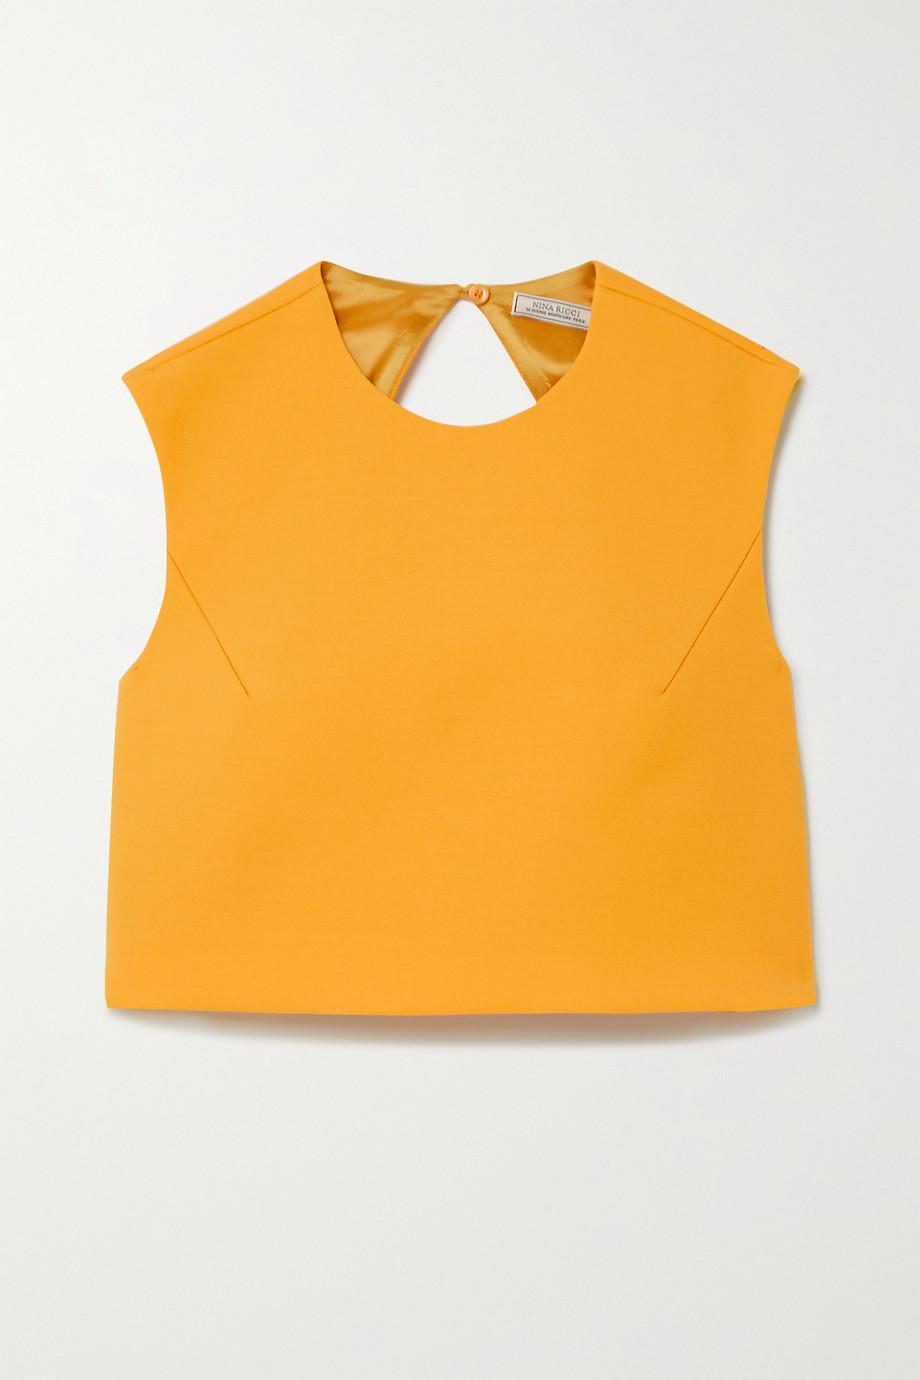 Nina Ricci Cropped open-back wool-blend top